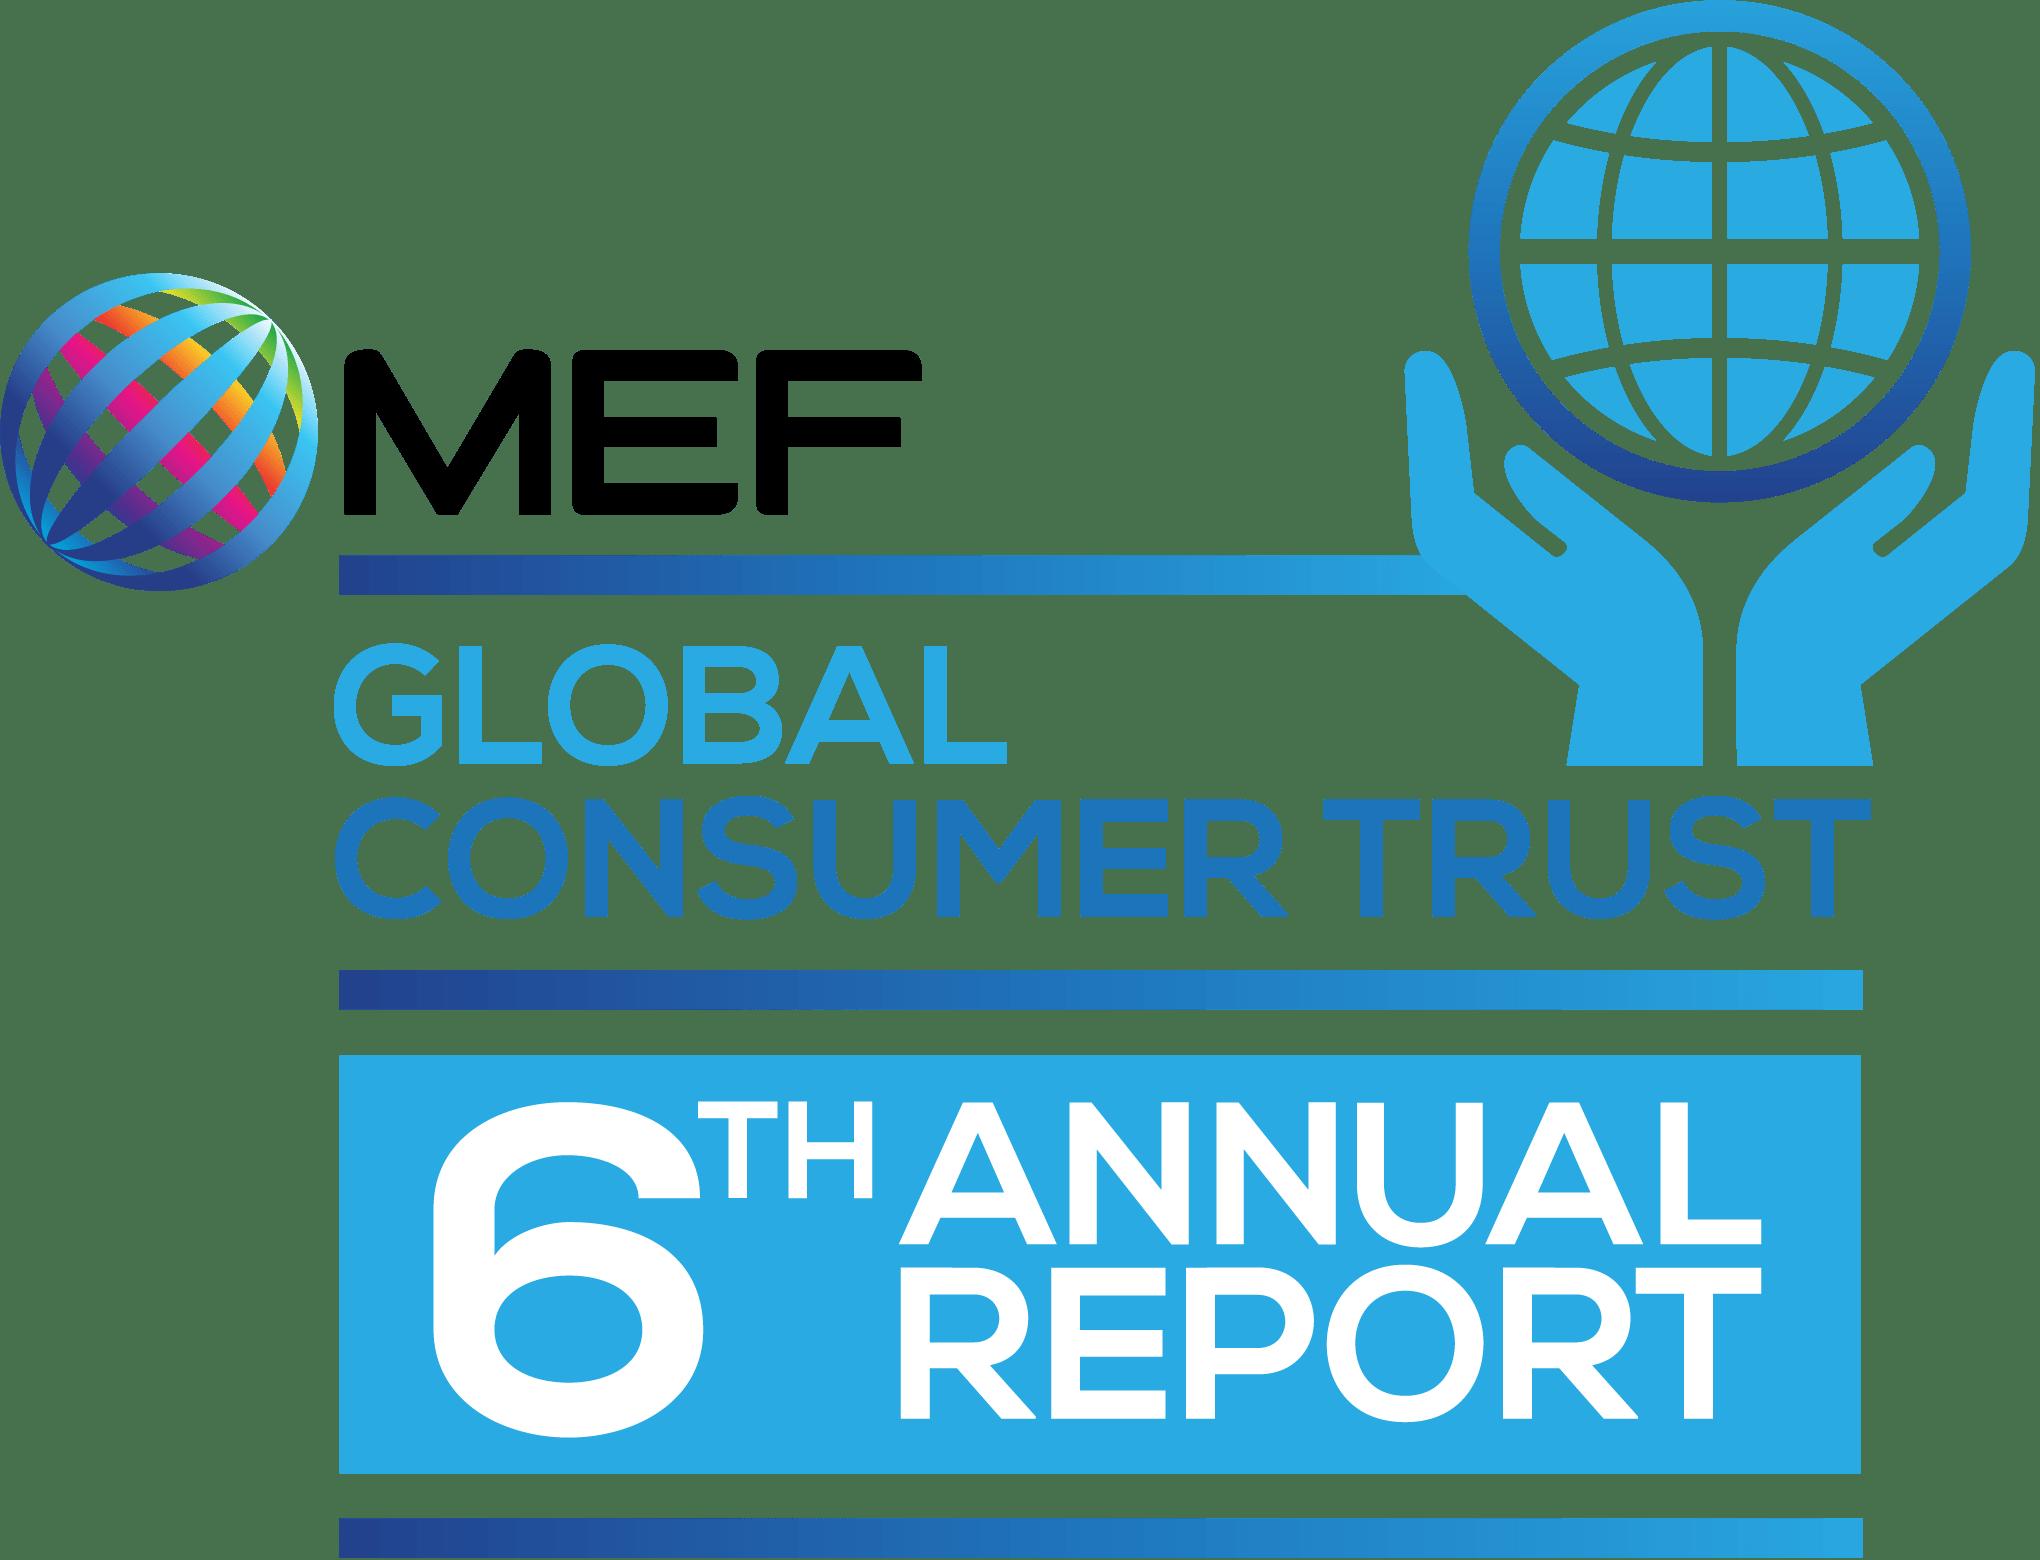 MEF's 6th annual Global Trust Report - April 2020